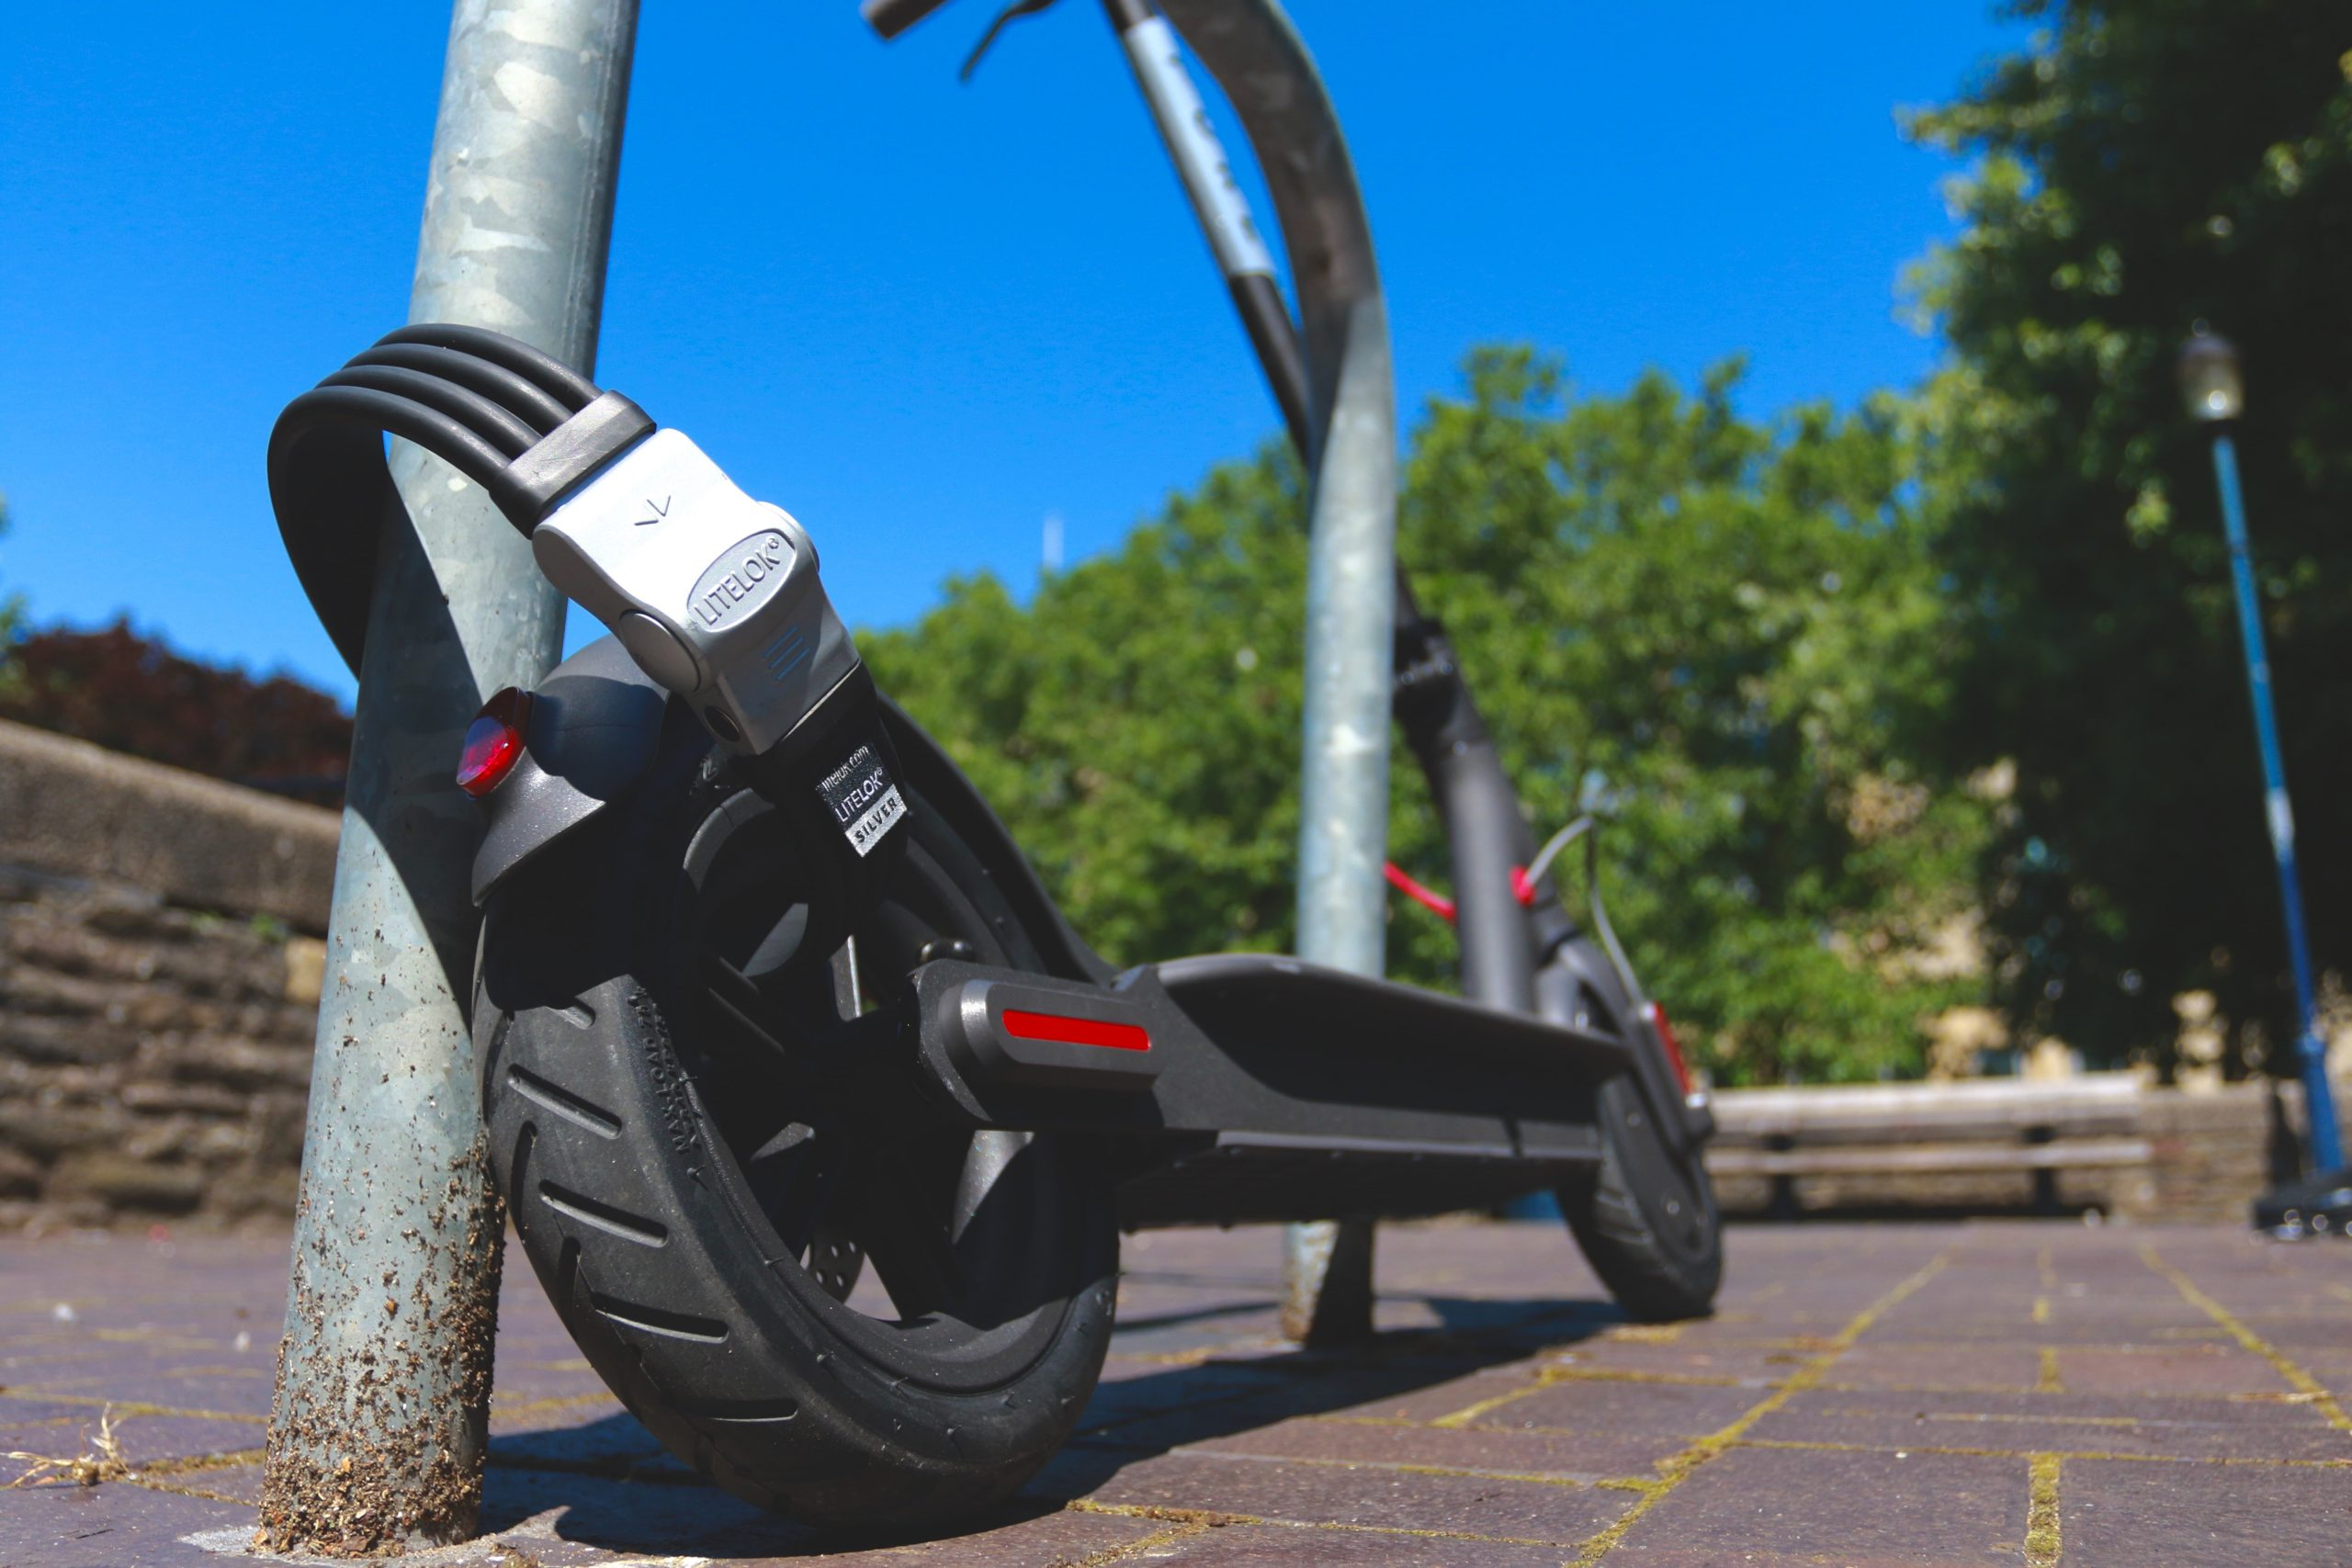 scooter litelok 2